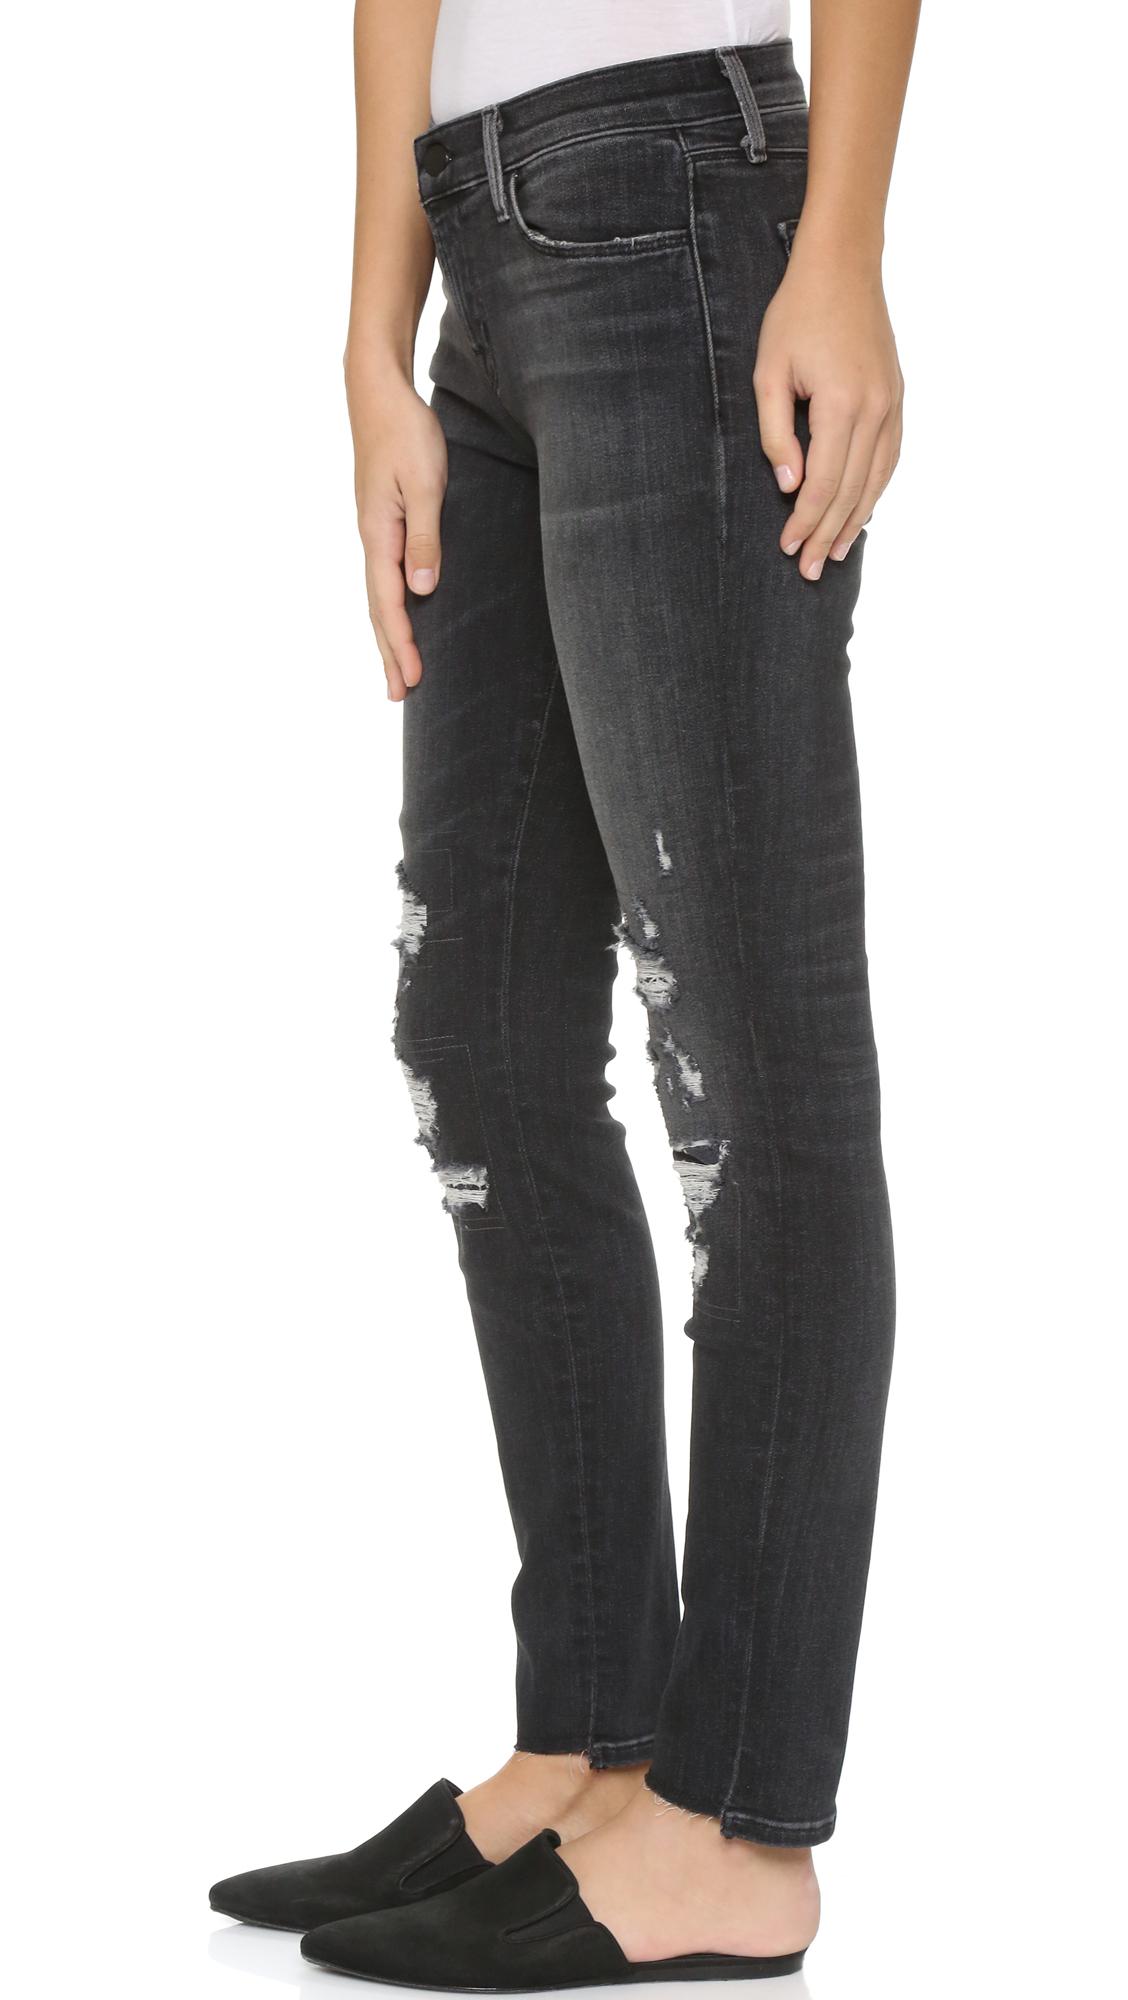 J brand 811 mid rise skinny jeans ink